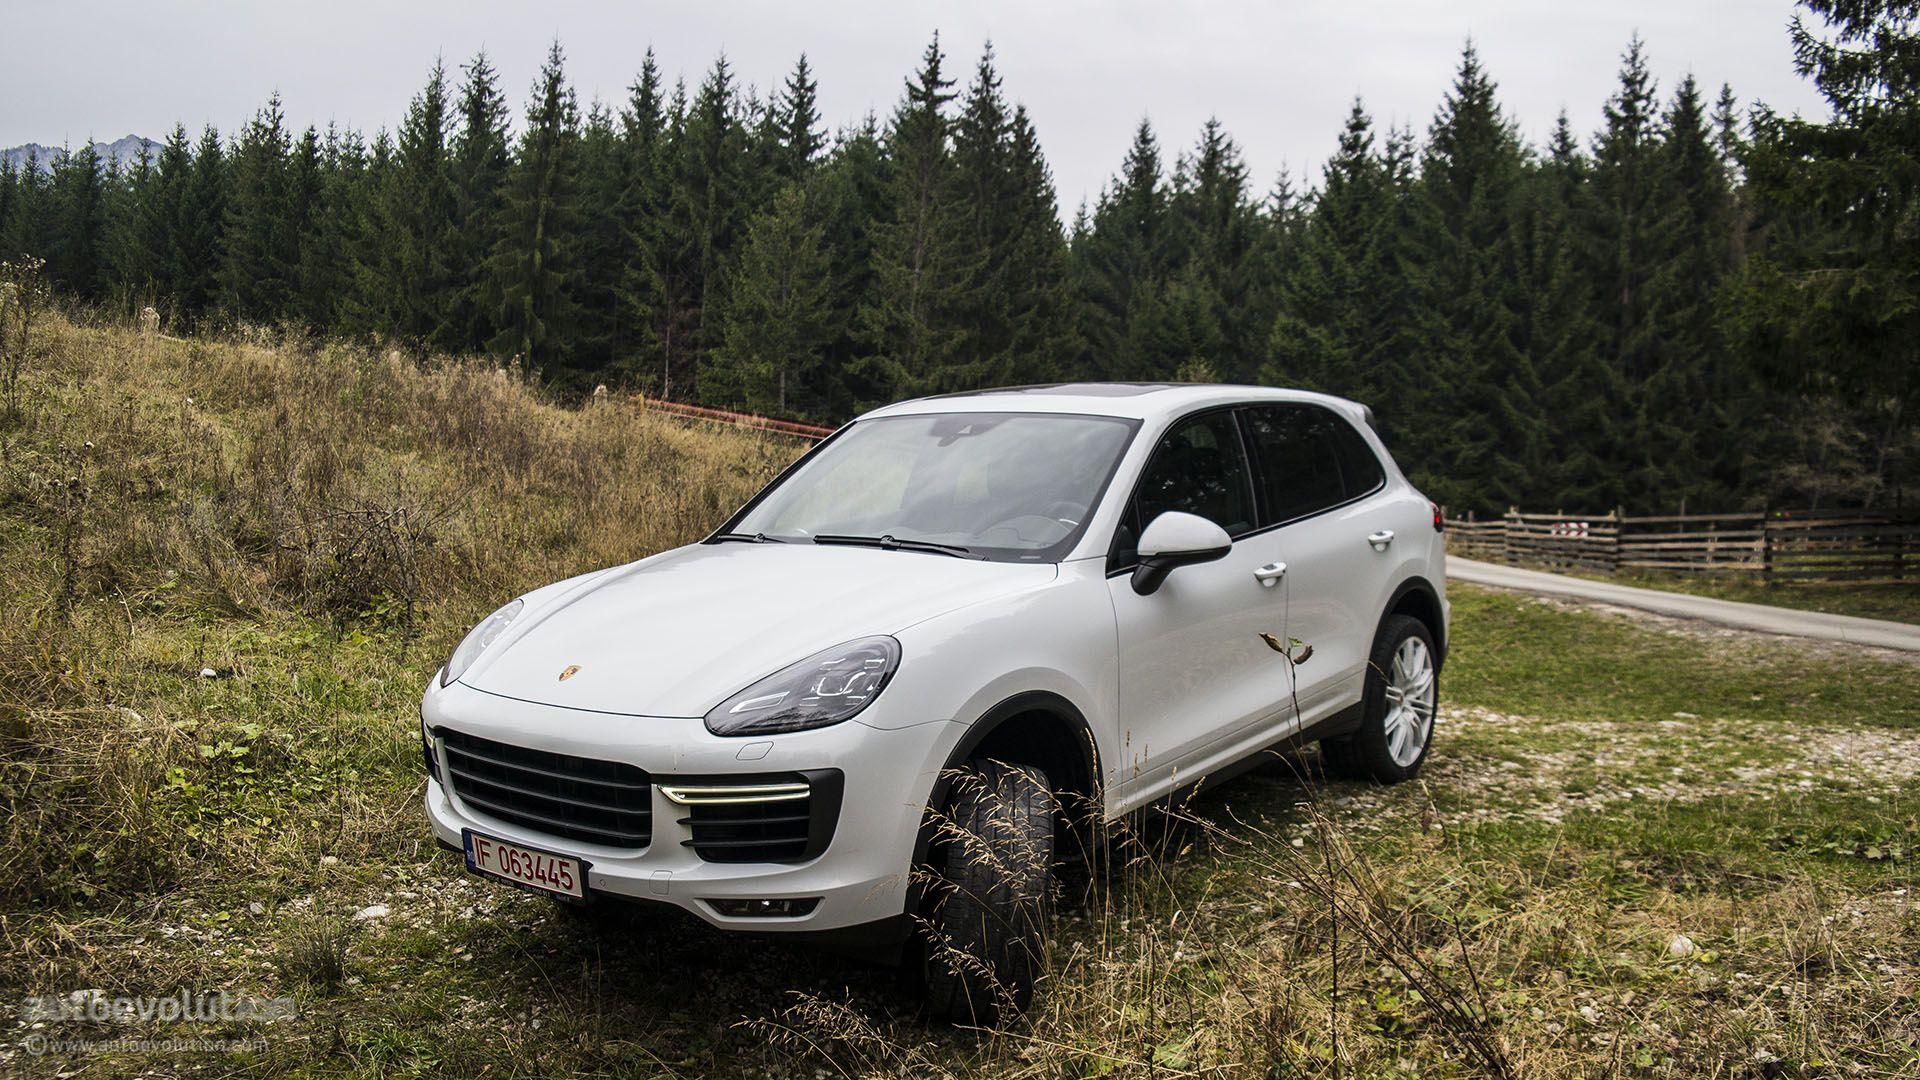 Hypermiling In A 2015 Porsche Cayenne Turbo Autoevolution